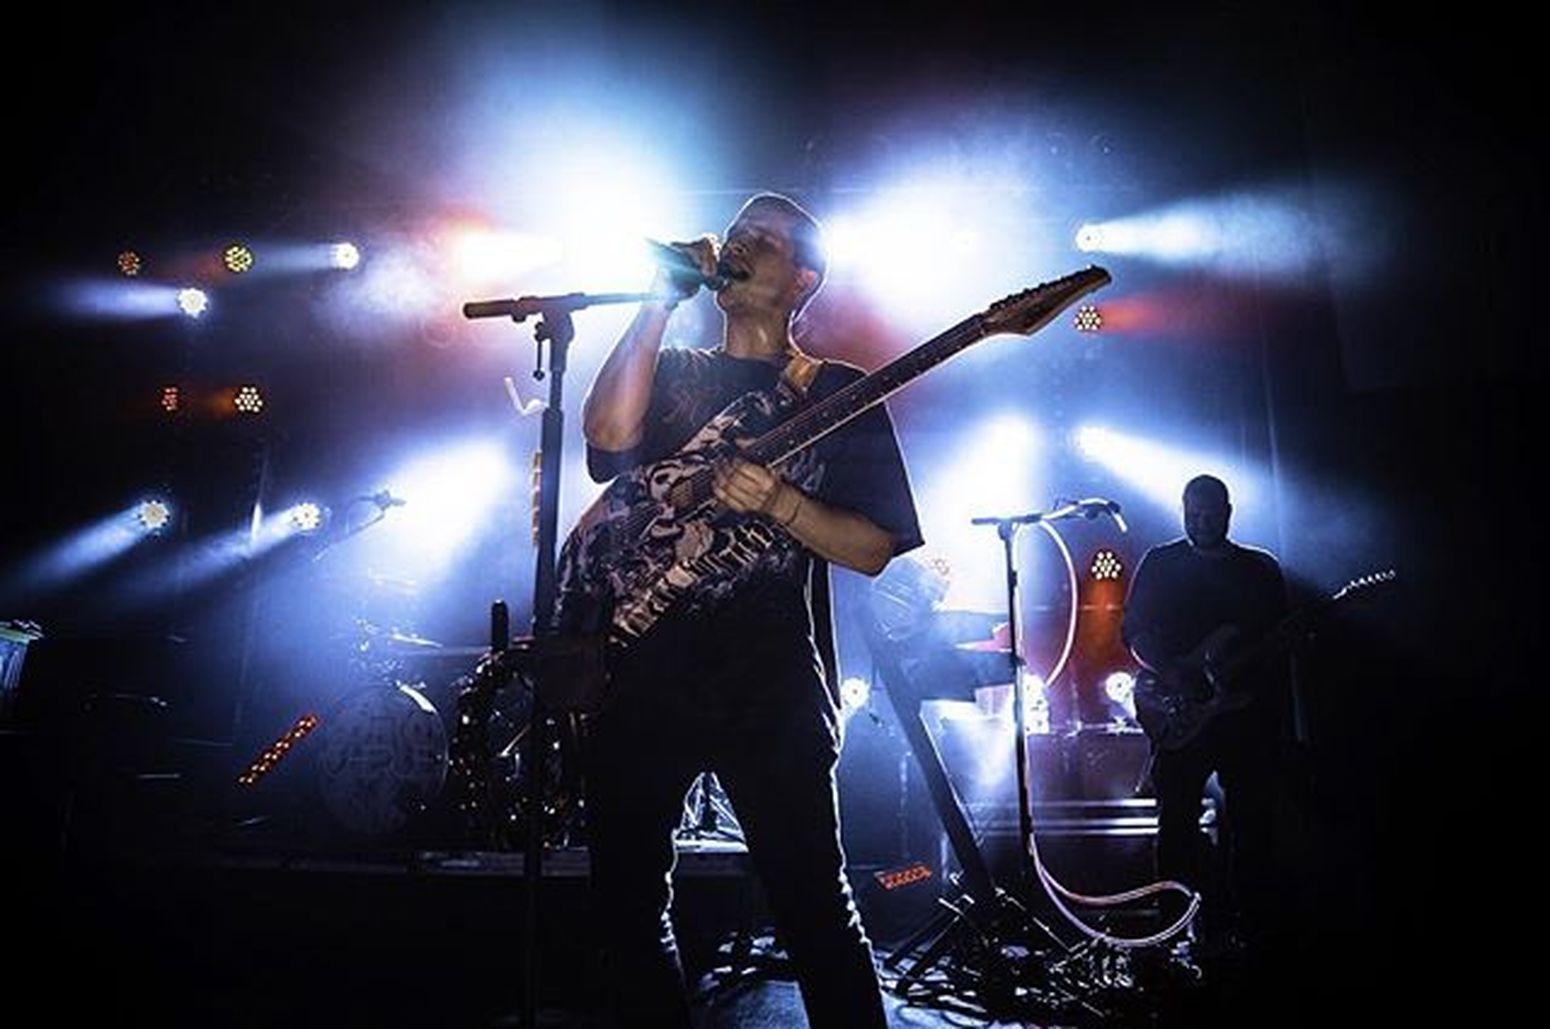 Cherub AVL Night 1 @sirenoftitan with the colorful light @cherublamusica Crowd Rock Pop Avl Asheville Music LiveMusic Concertphotography Concert Cherub Cherublamusica Guitar Guitarist Suhr